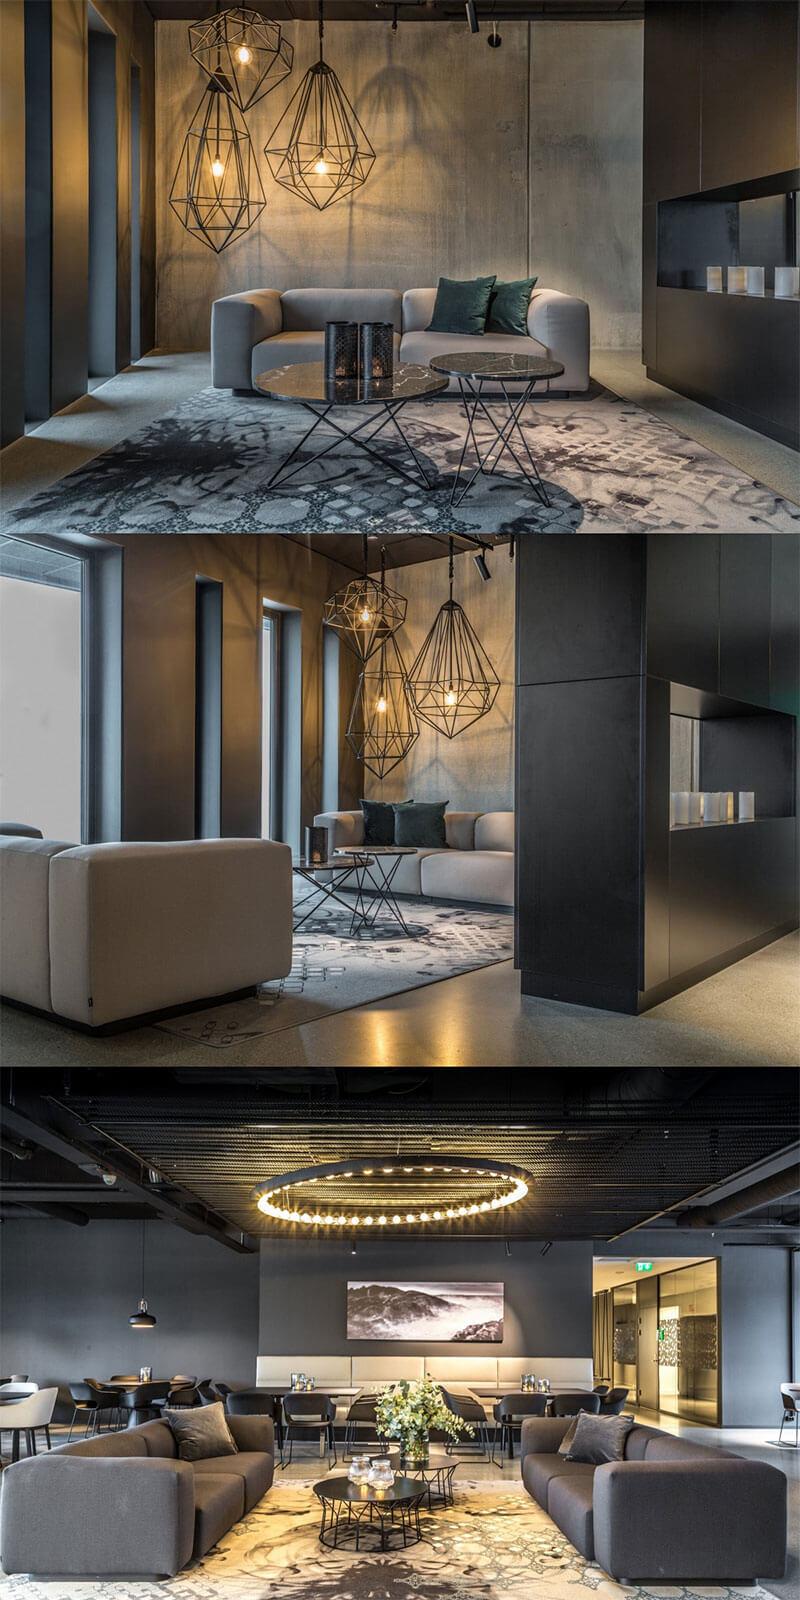 nordsjo-kontorpark-offices-haugesund